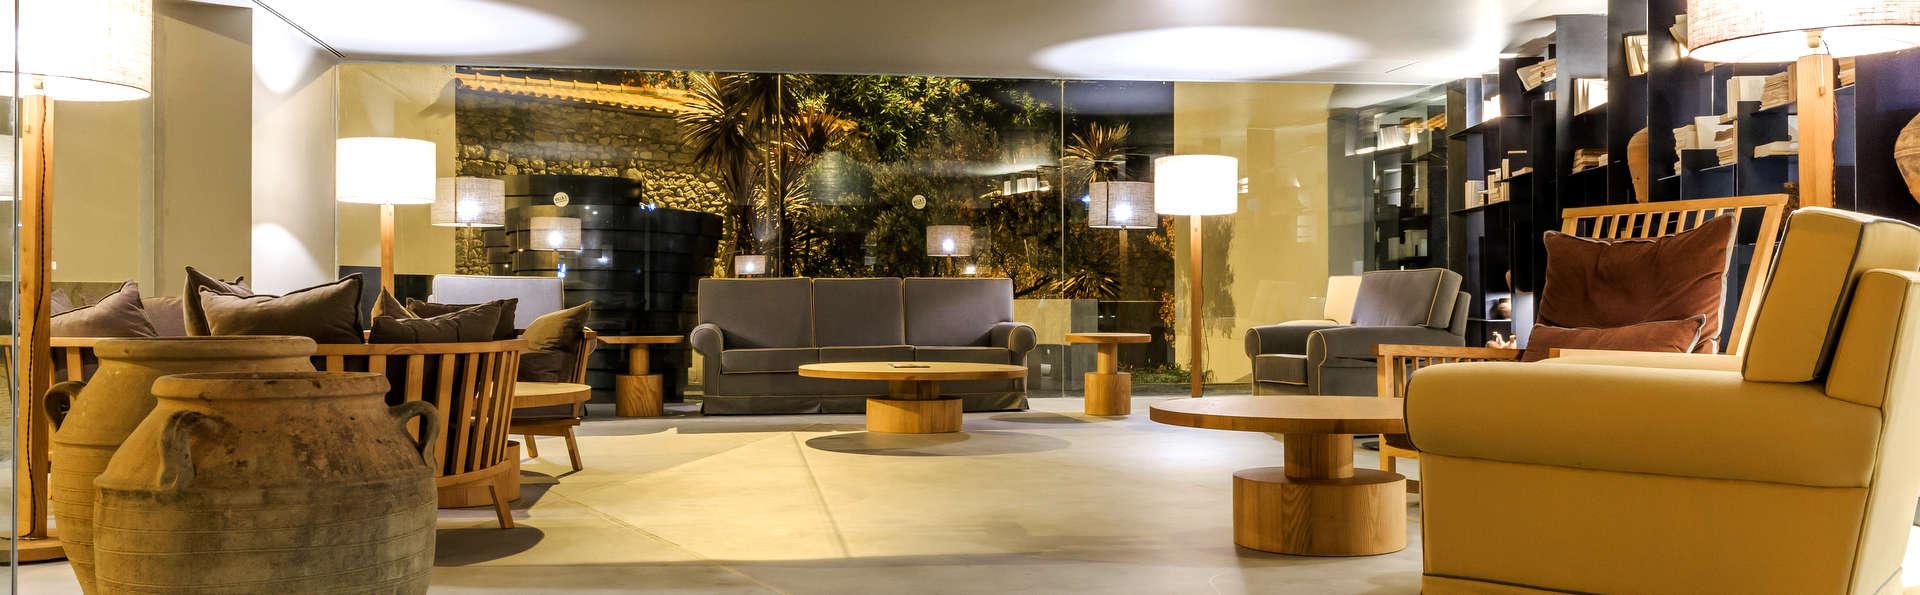 Villa C Boutique Hotel By Ymspyra - Edit_Lobby2.jpg